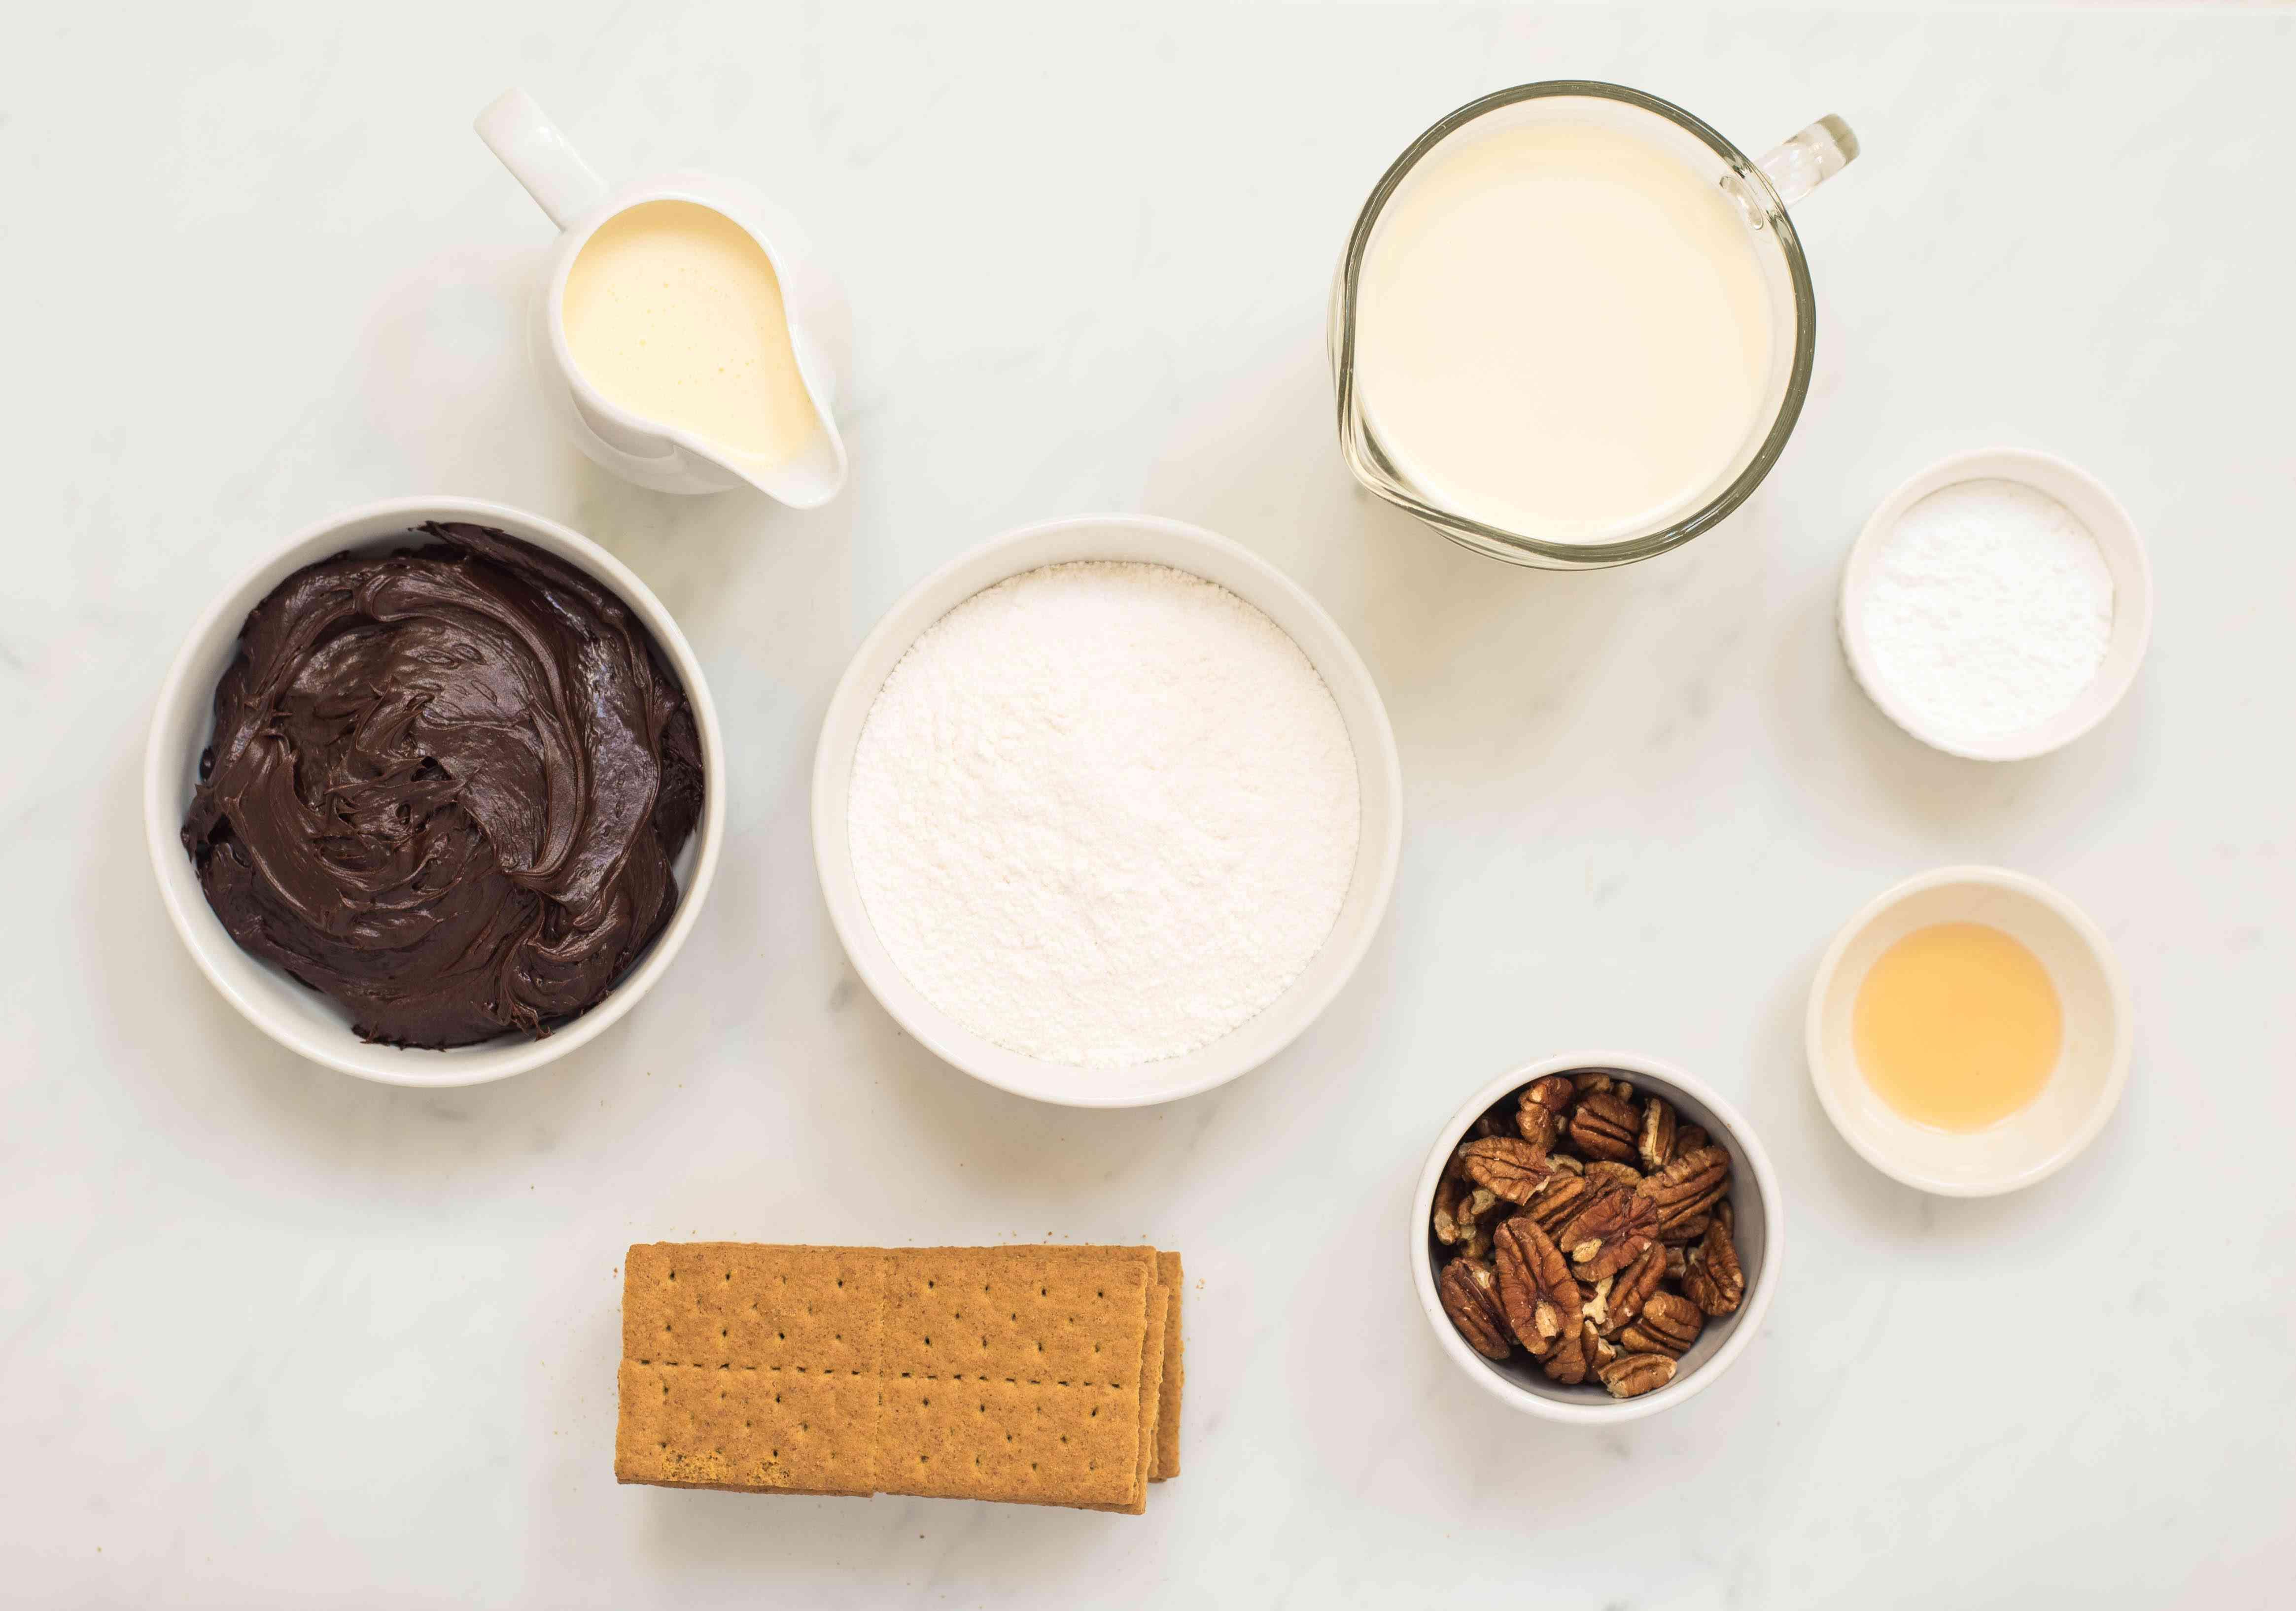 Ingredients for graham cracker icebox cake